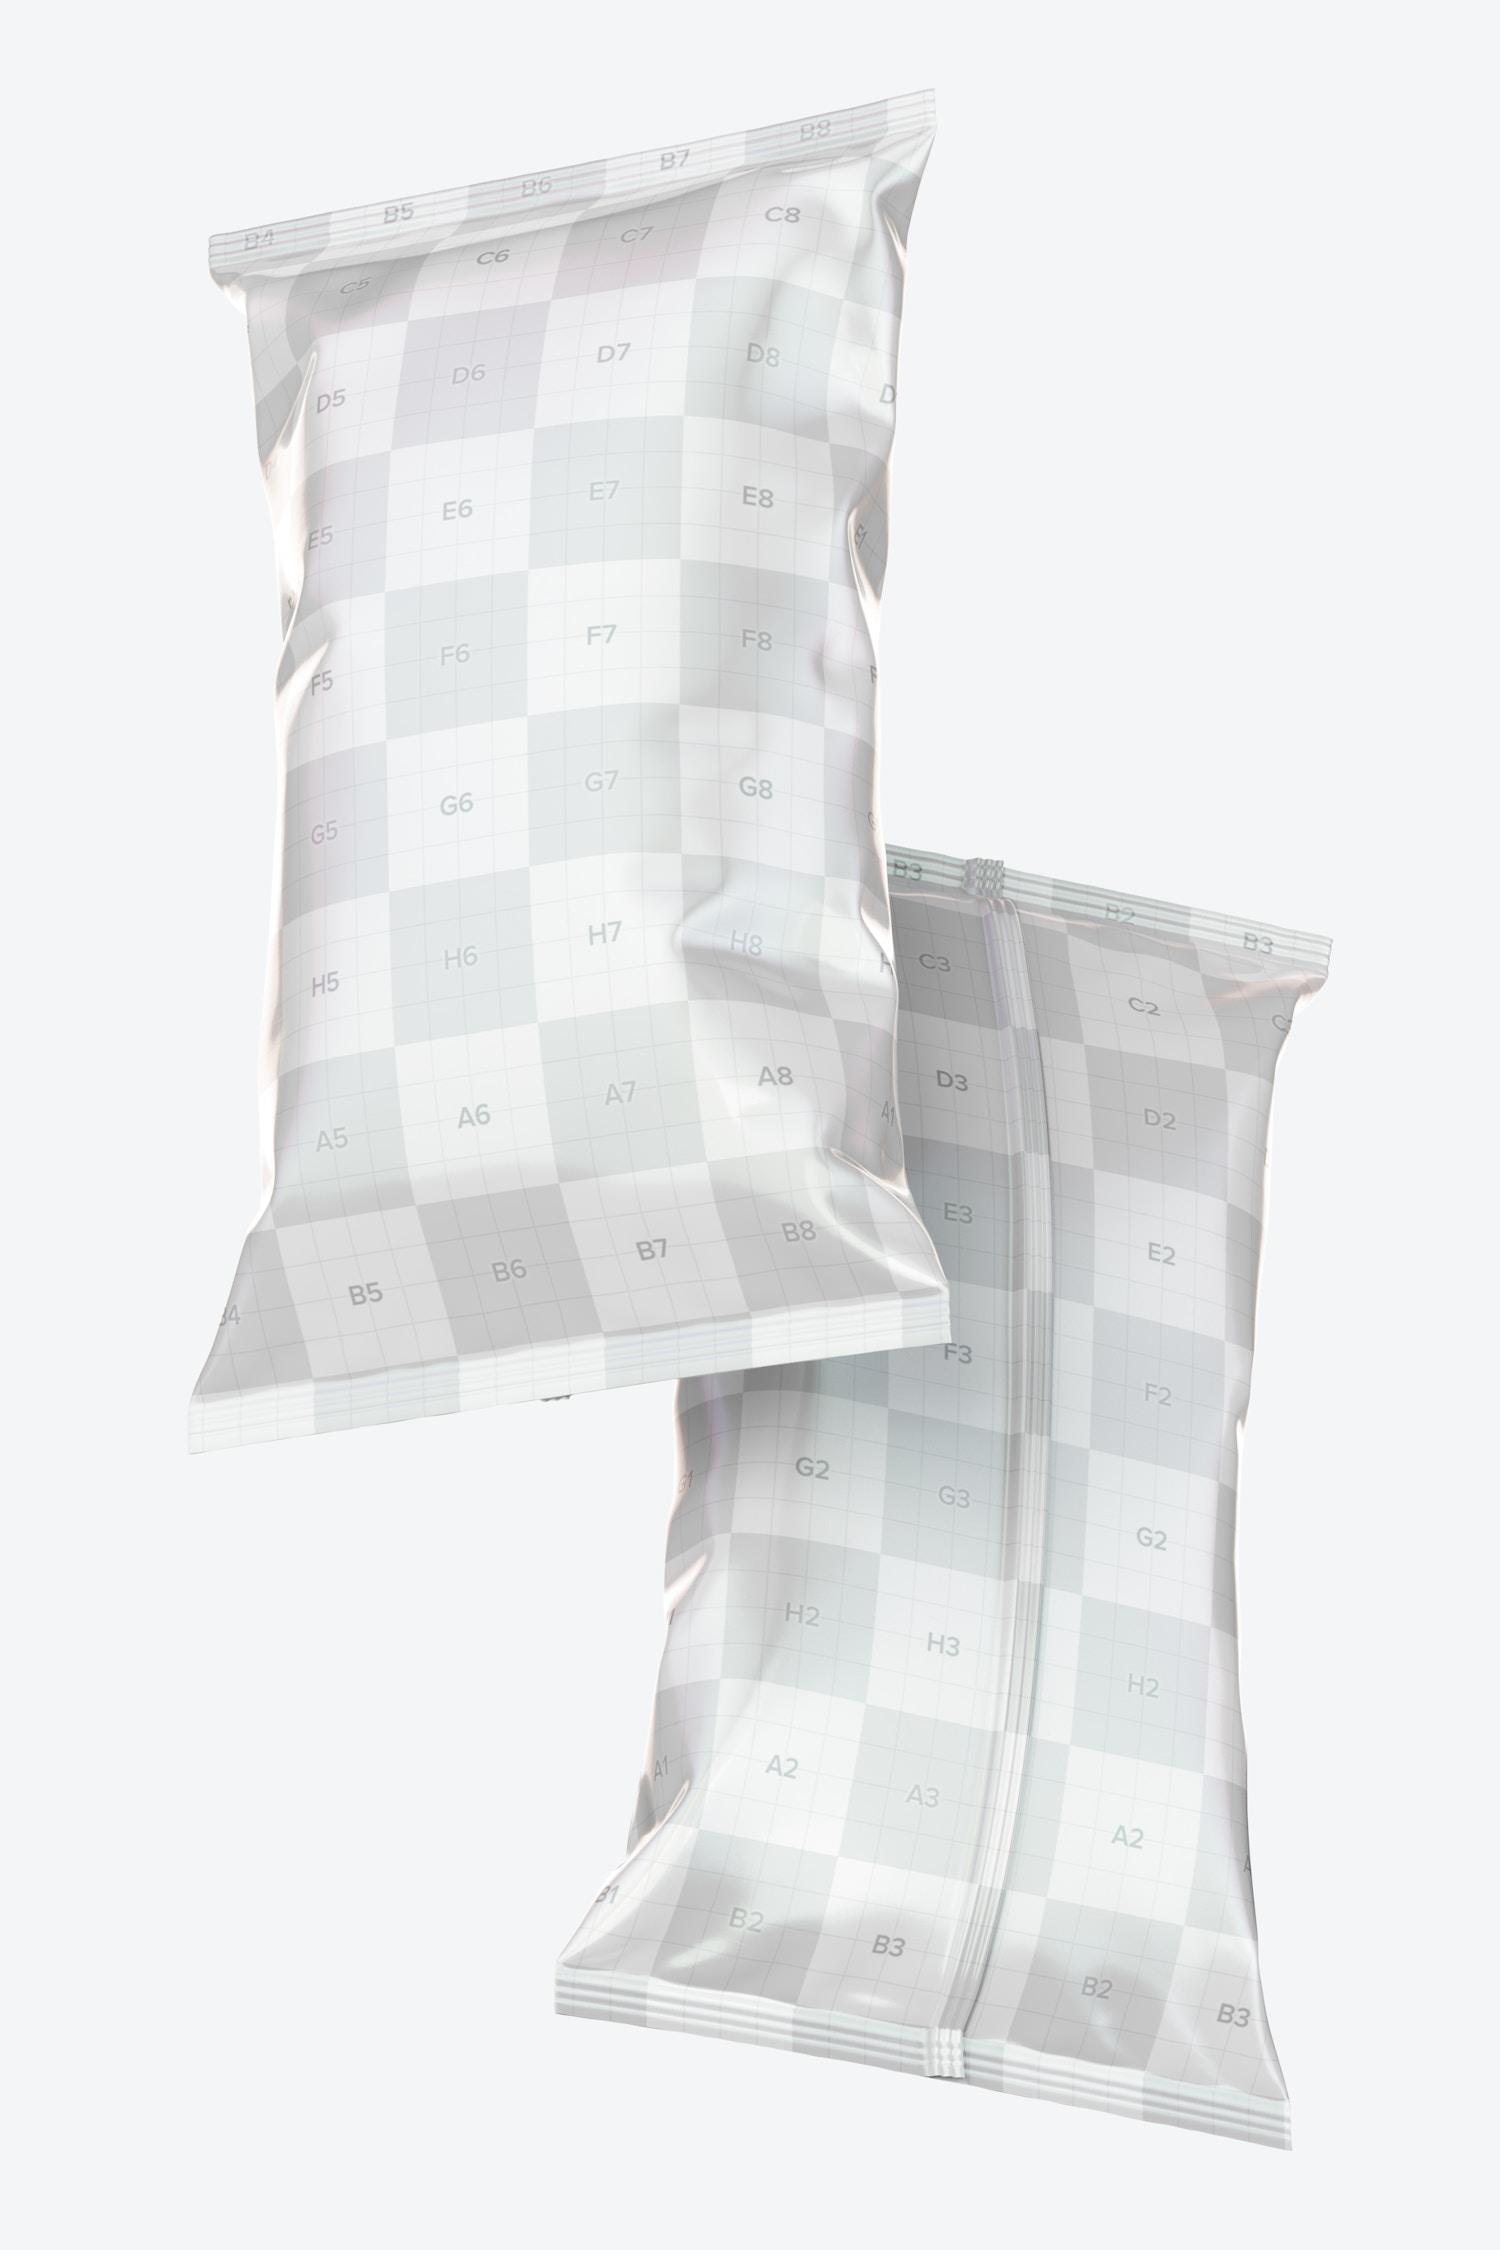 Glossy Sleek Chips Bags Mockup